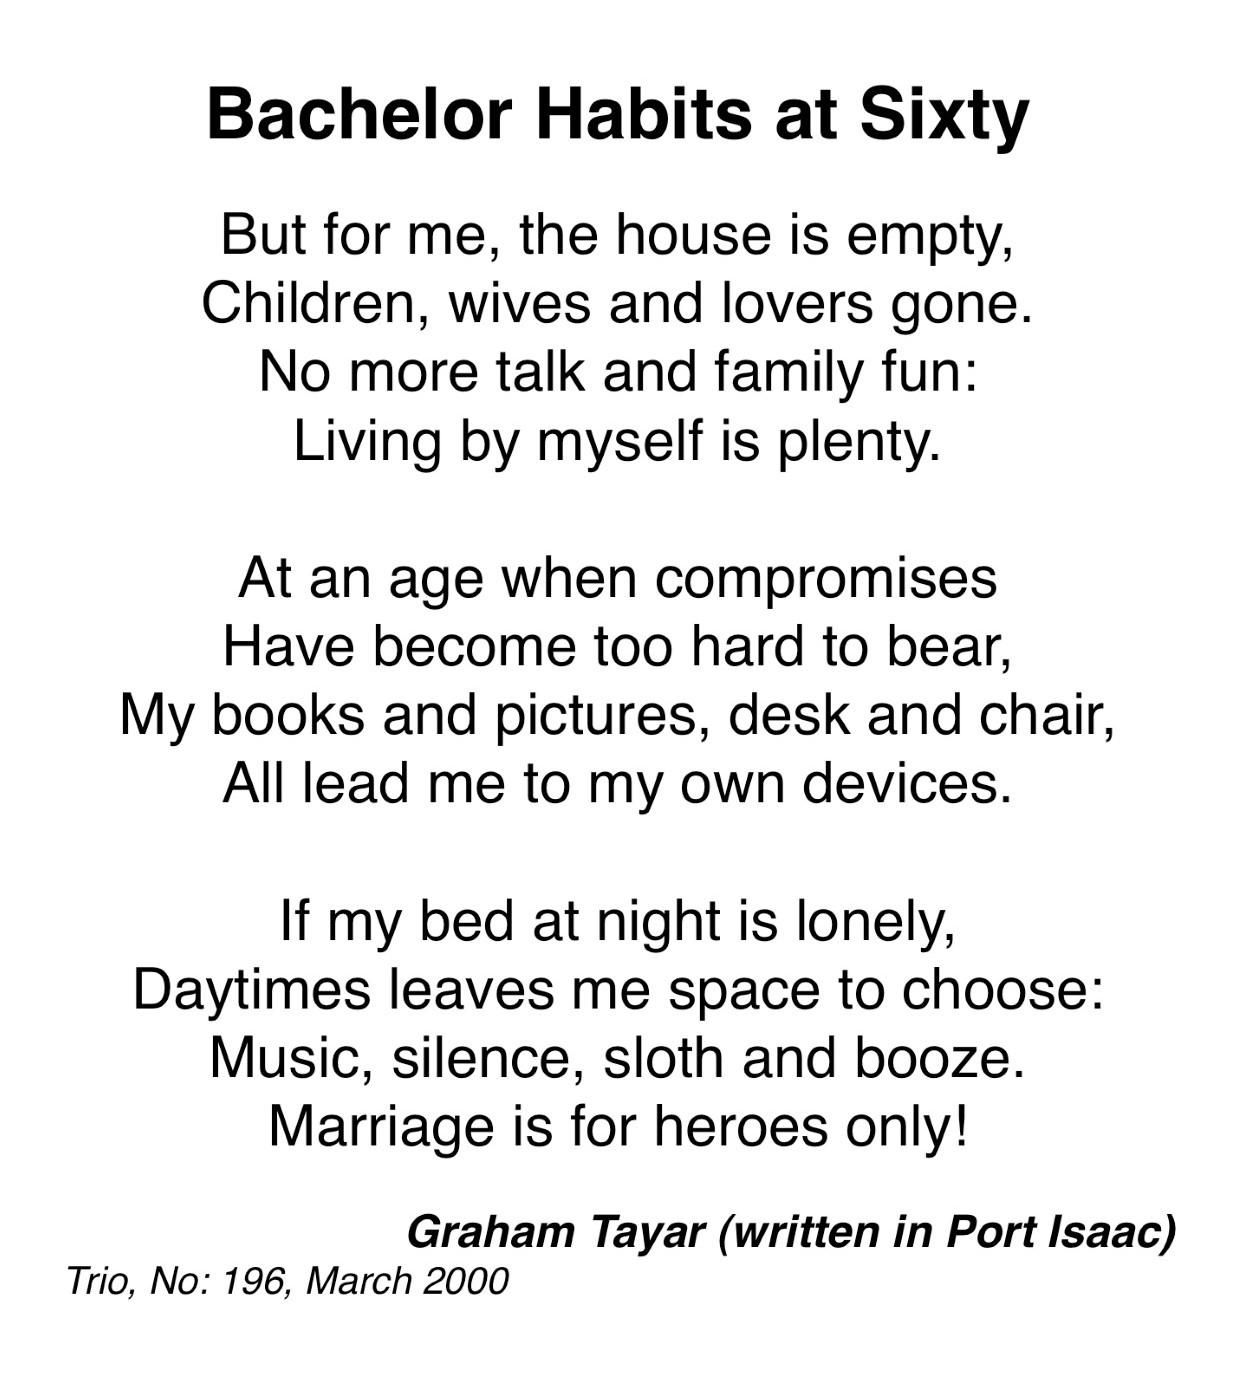 Bachelor Habits at Sixty